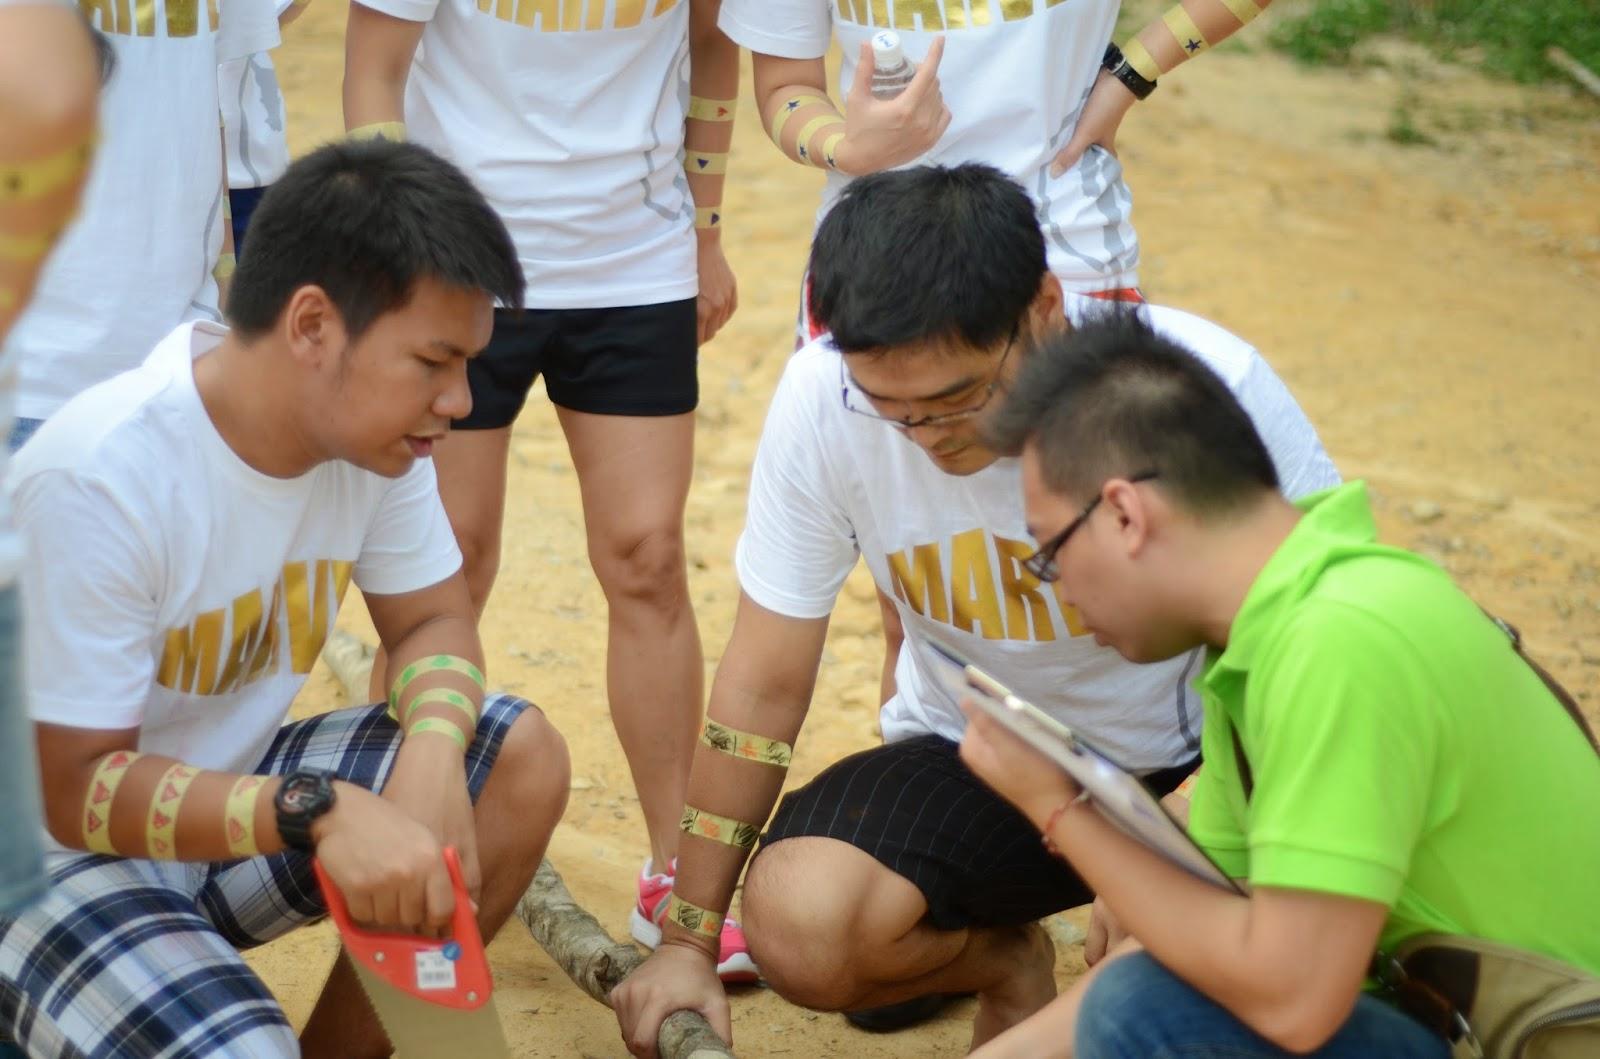 Malacca Adventure Teambuilding - 5 Elements Concept - www.bigtreetours.com